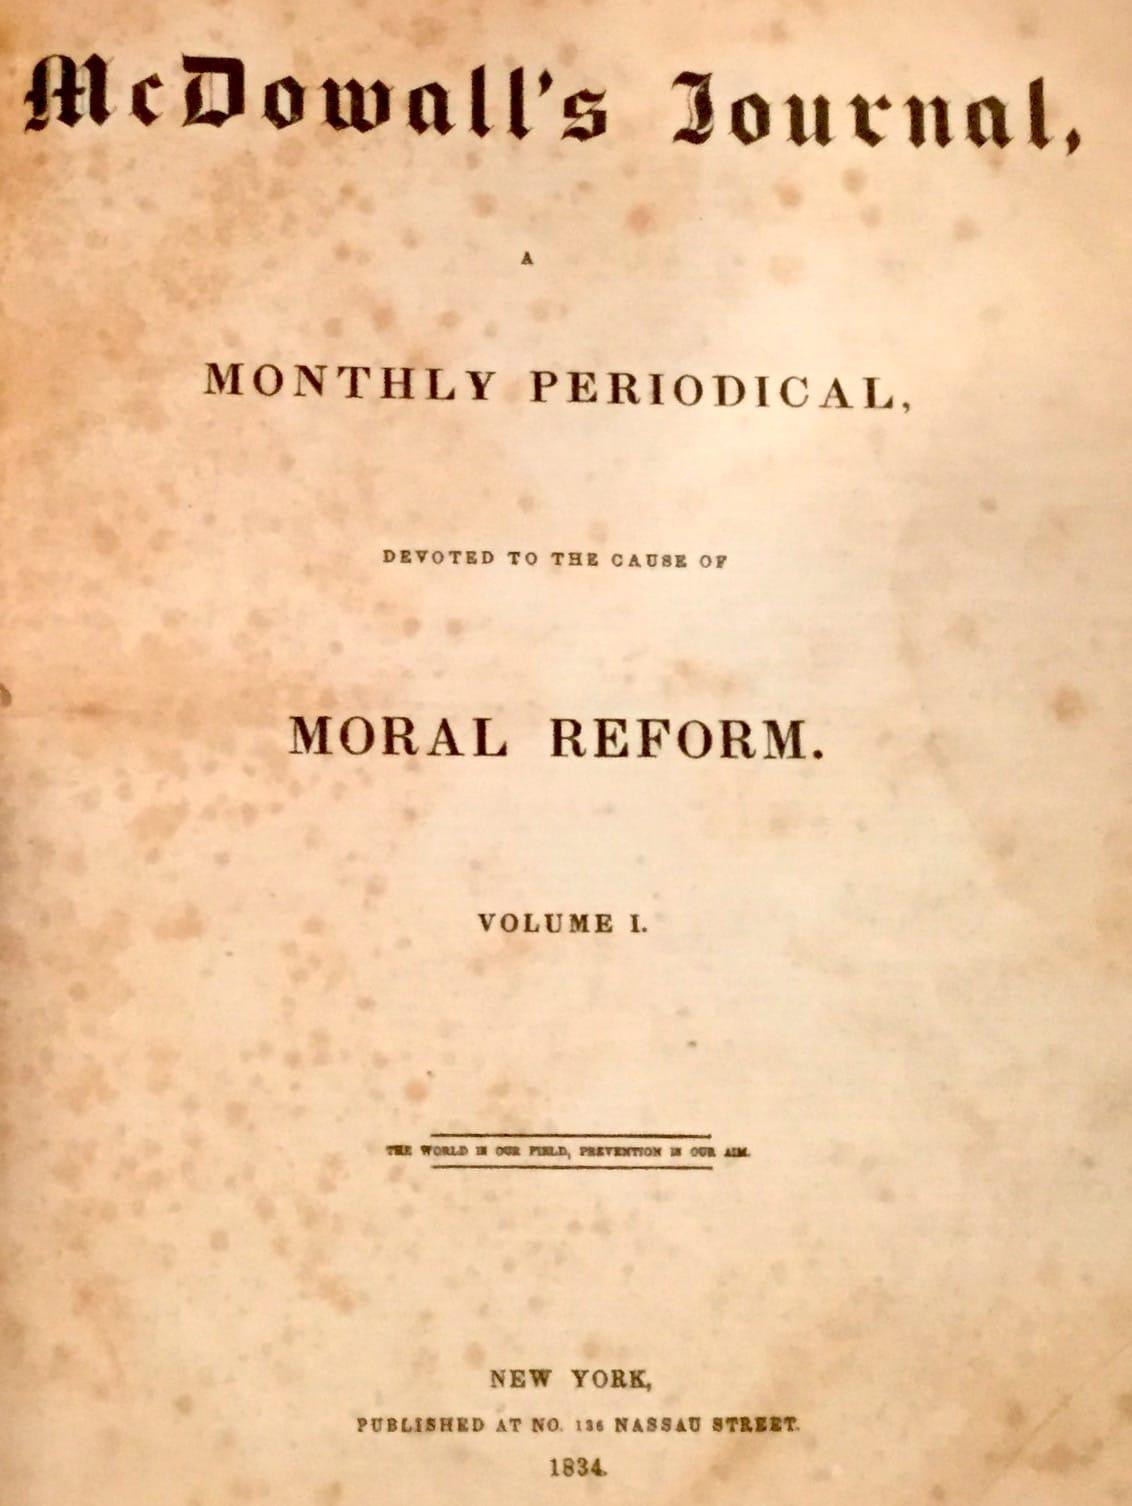 McDowall's Journal